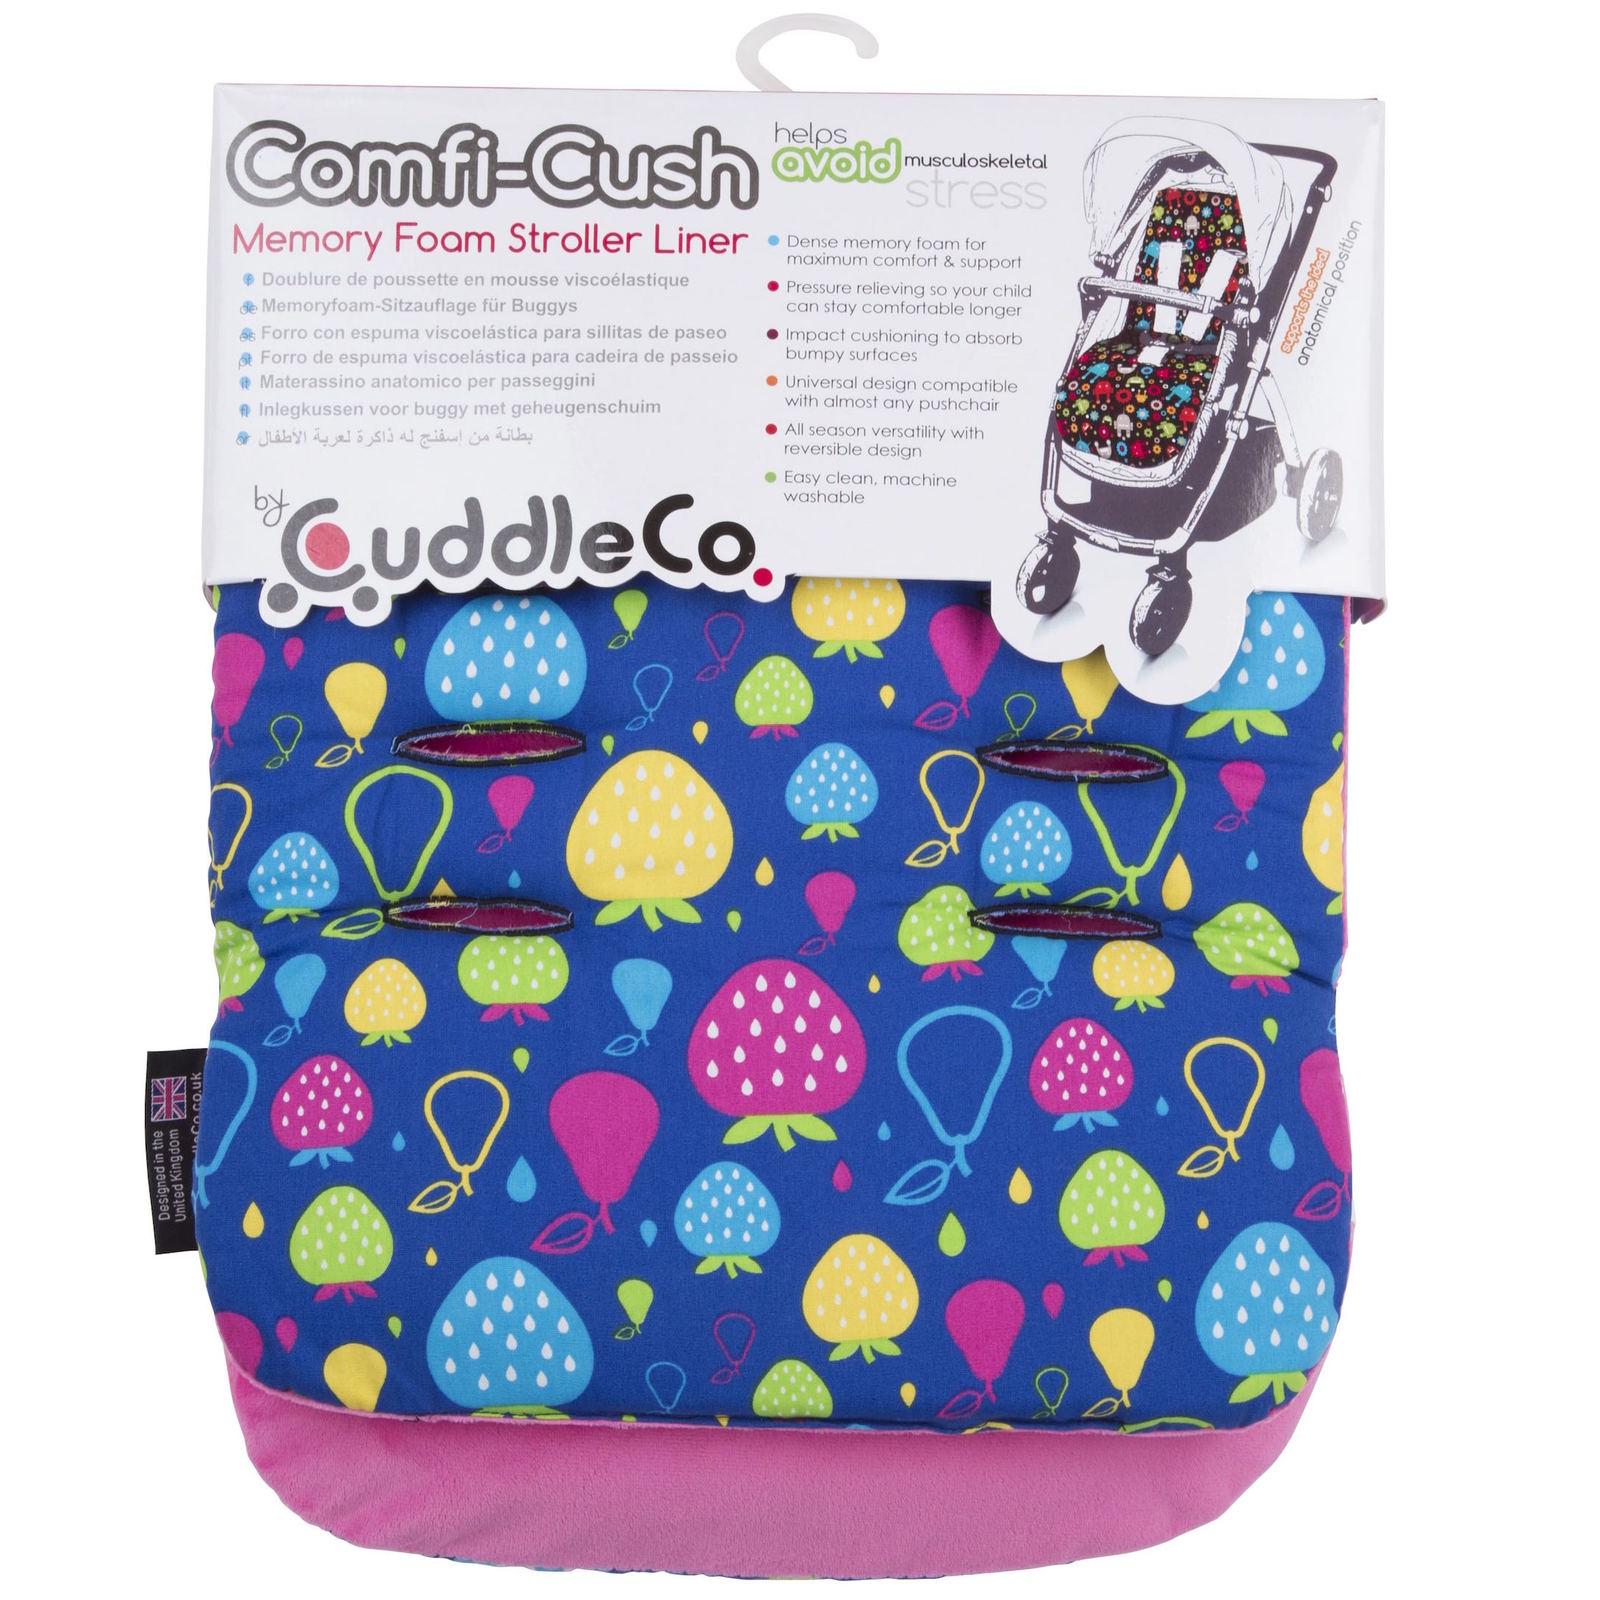 Cuddle Co: Comfi-Cush Memory Foam Stroller Liner - Tutti Frutti image